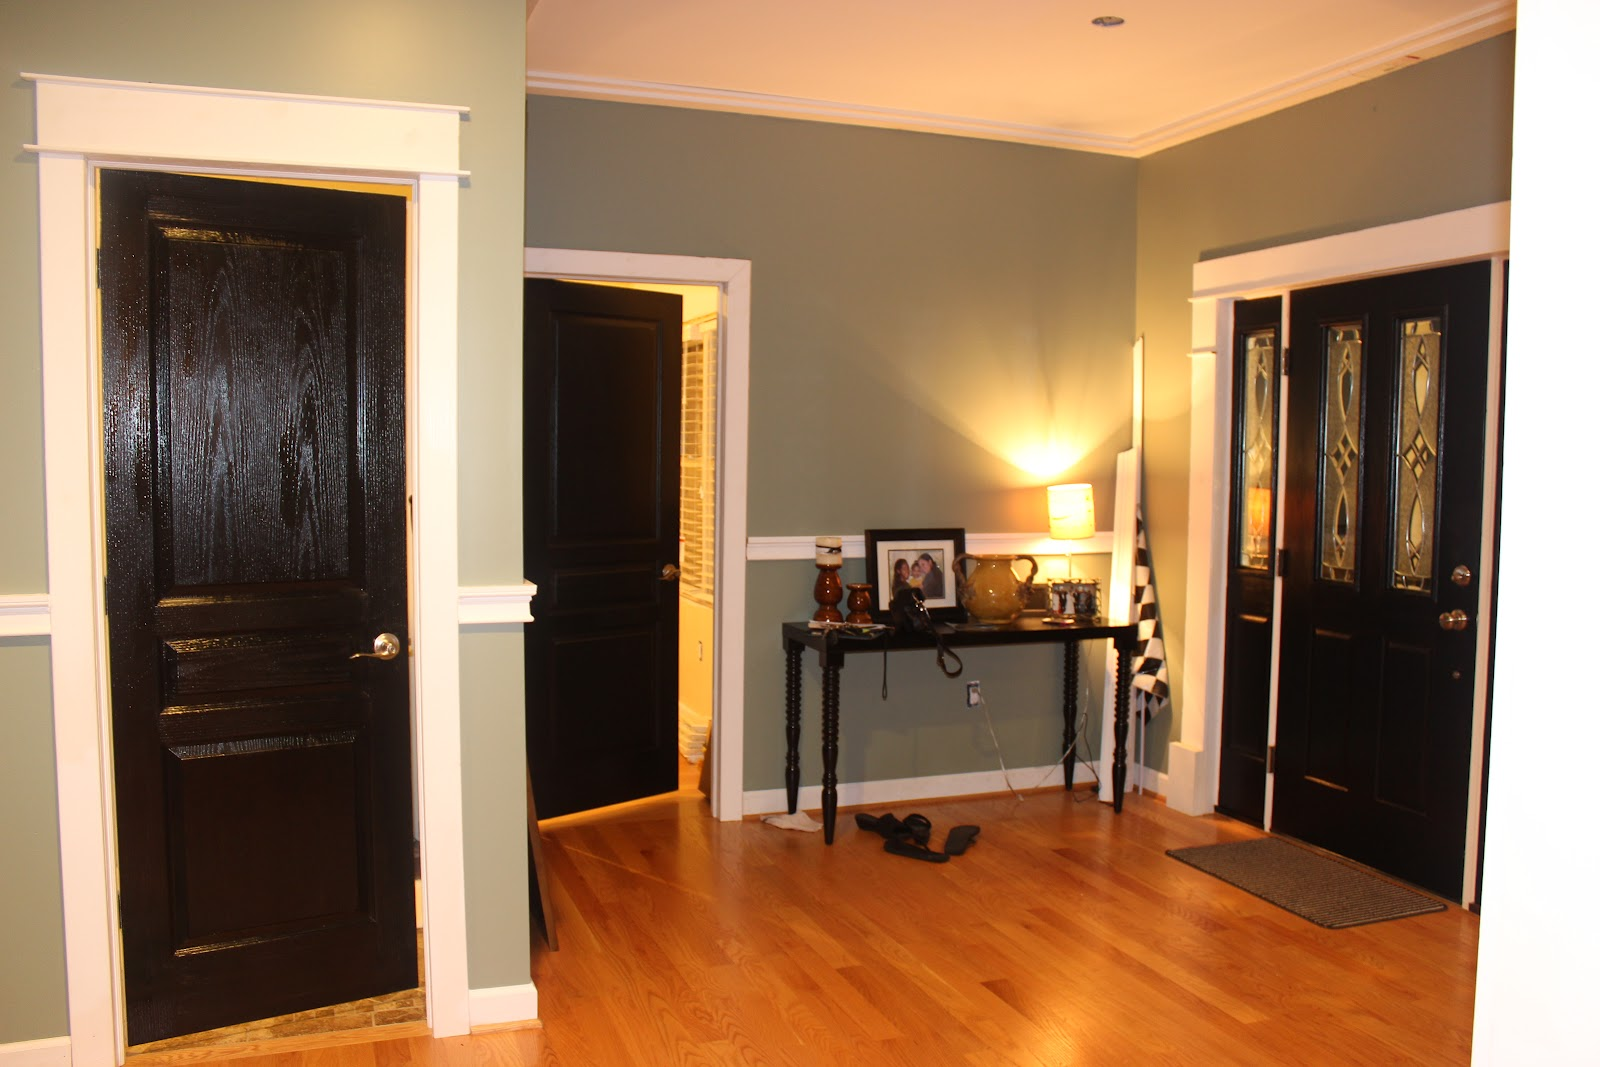 Elegant look of black interior doors bfm family now with powder room door planetlyrics Image collections